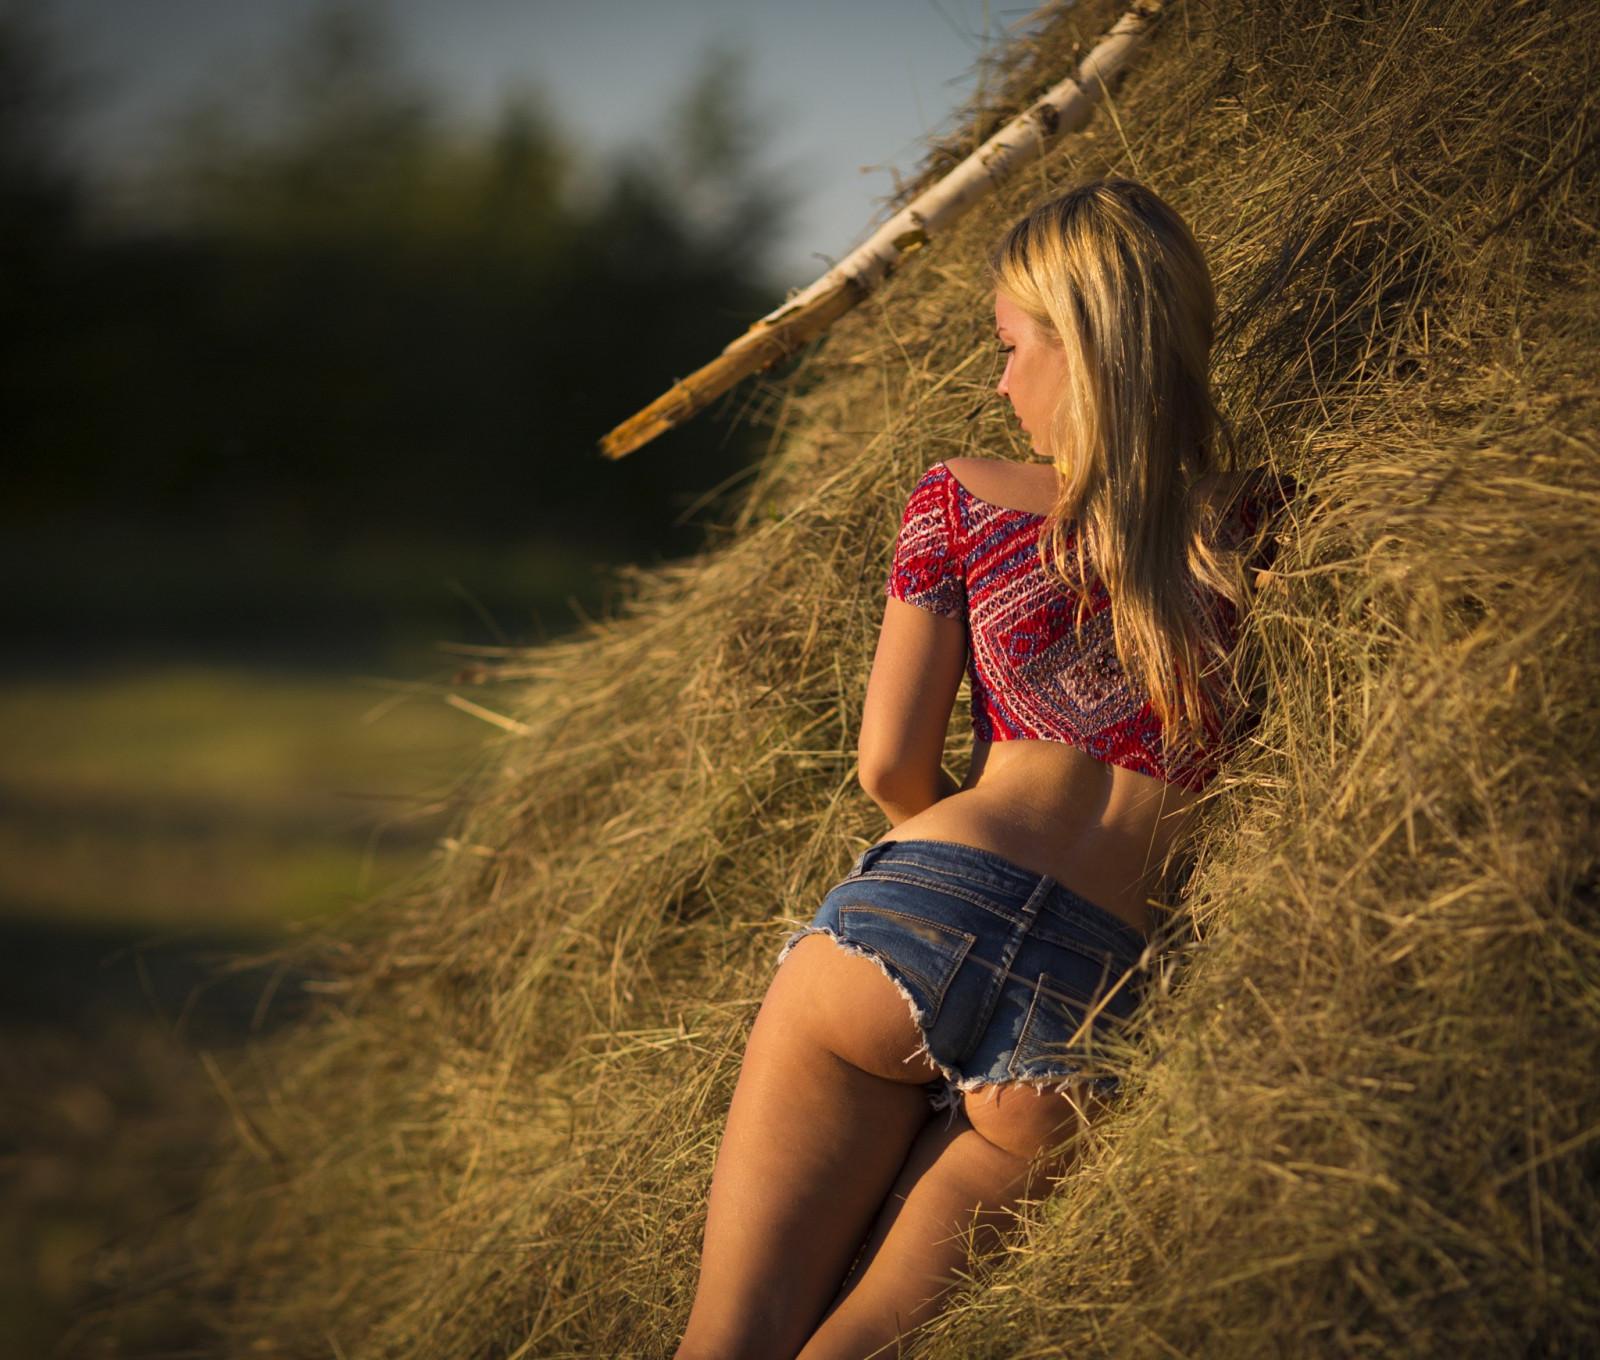 Красивые девушки на природе в деревне